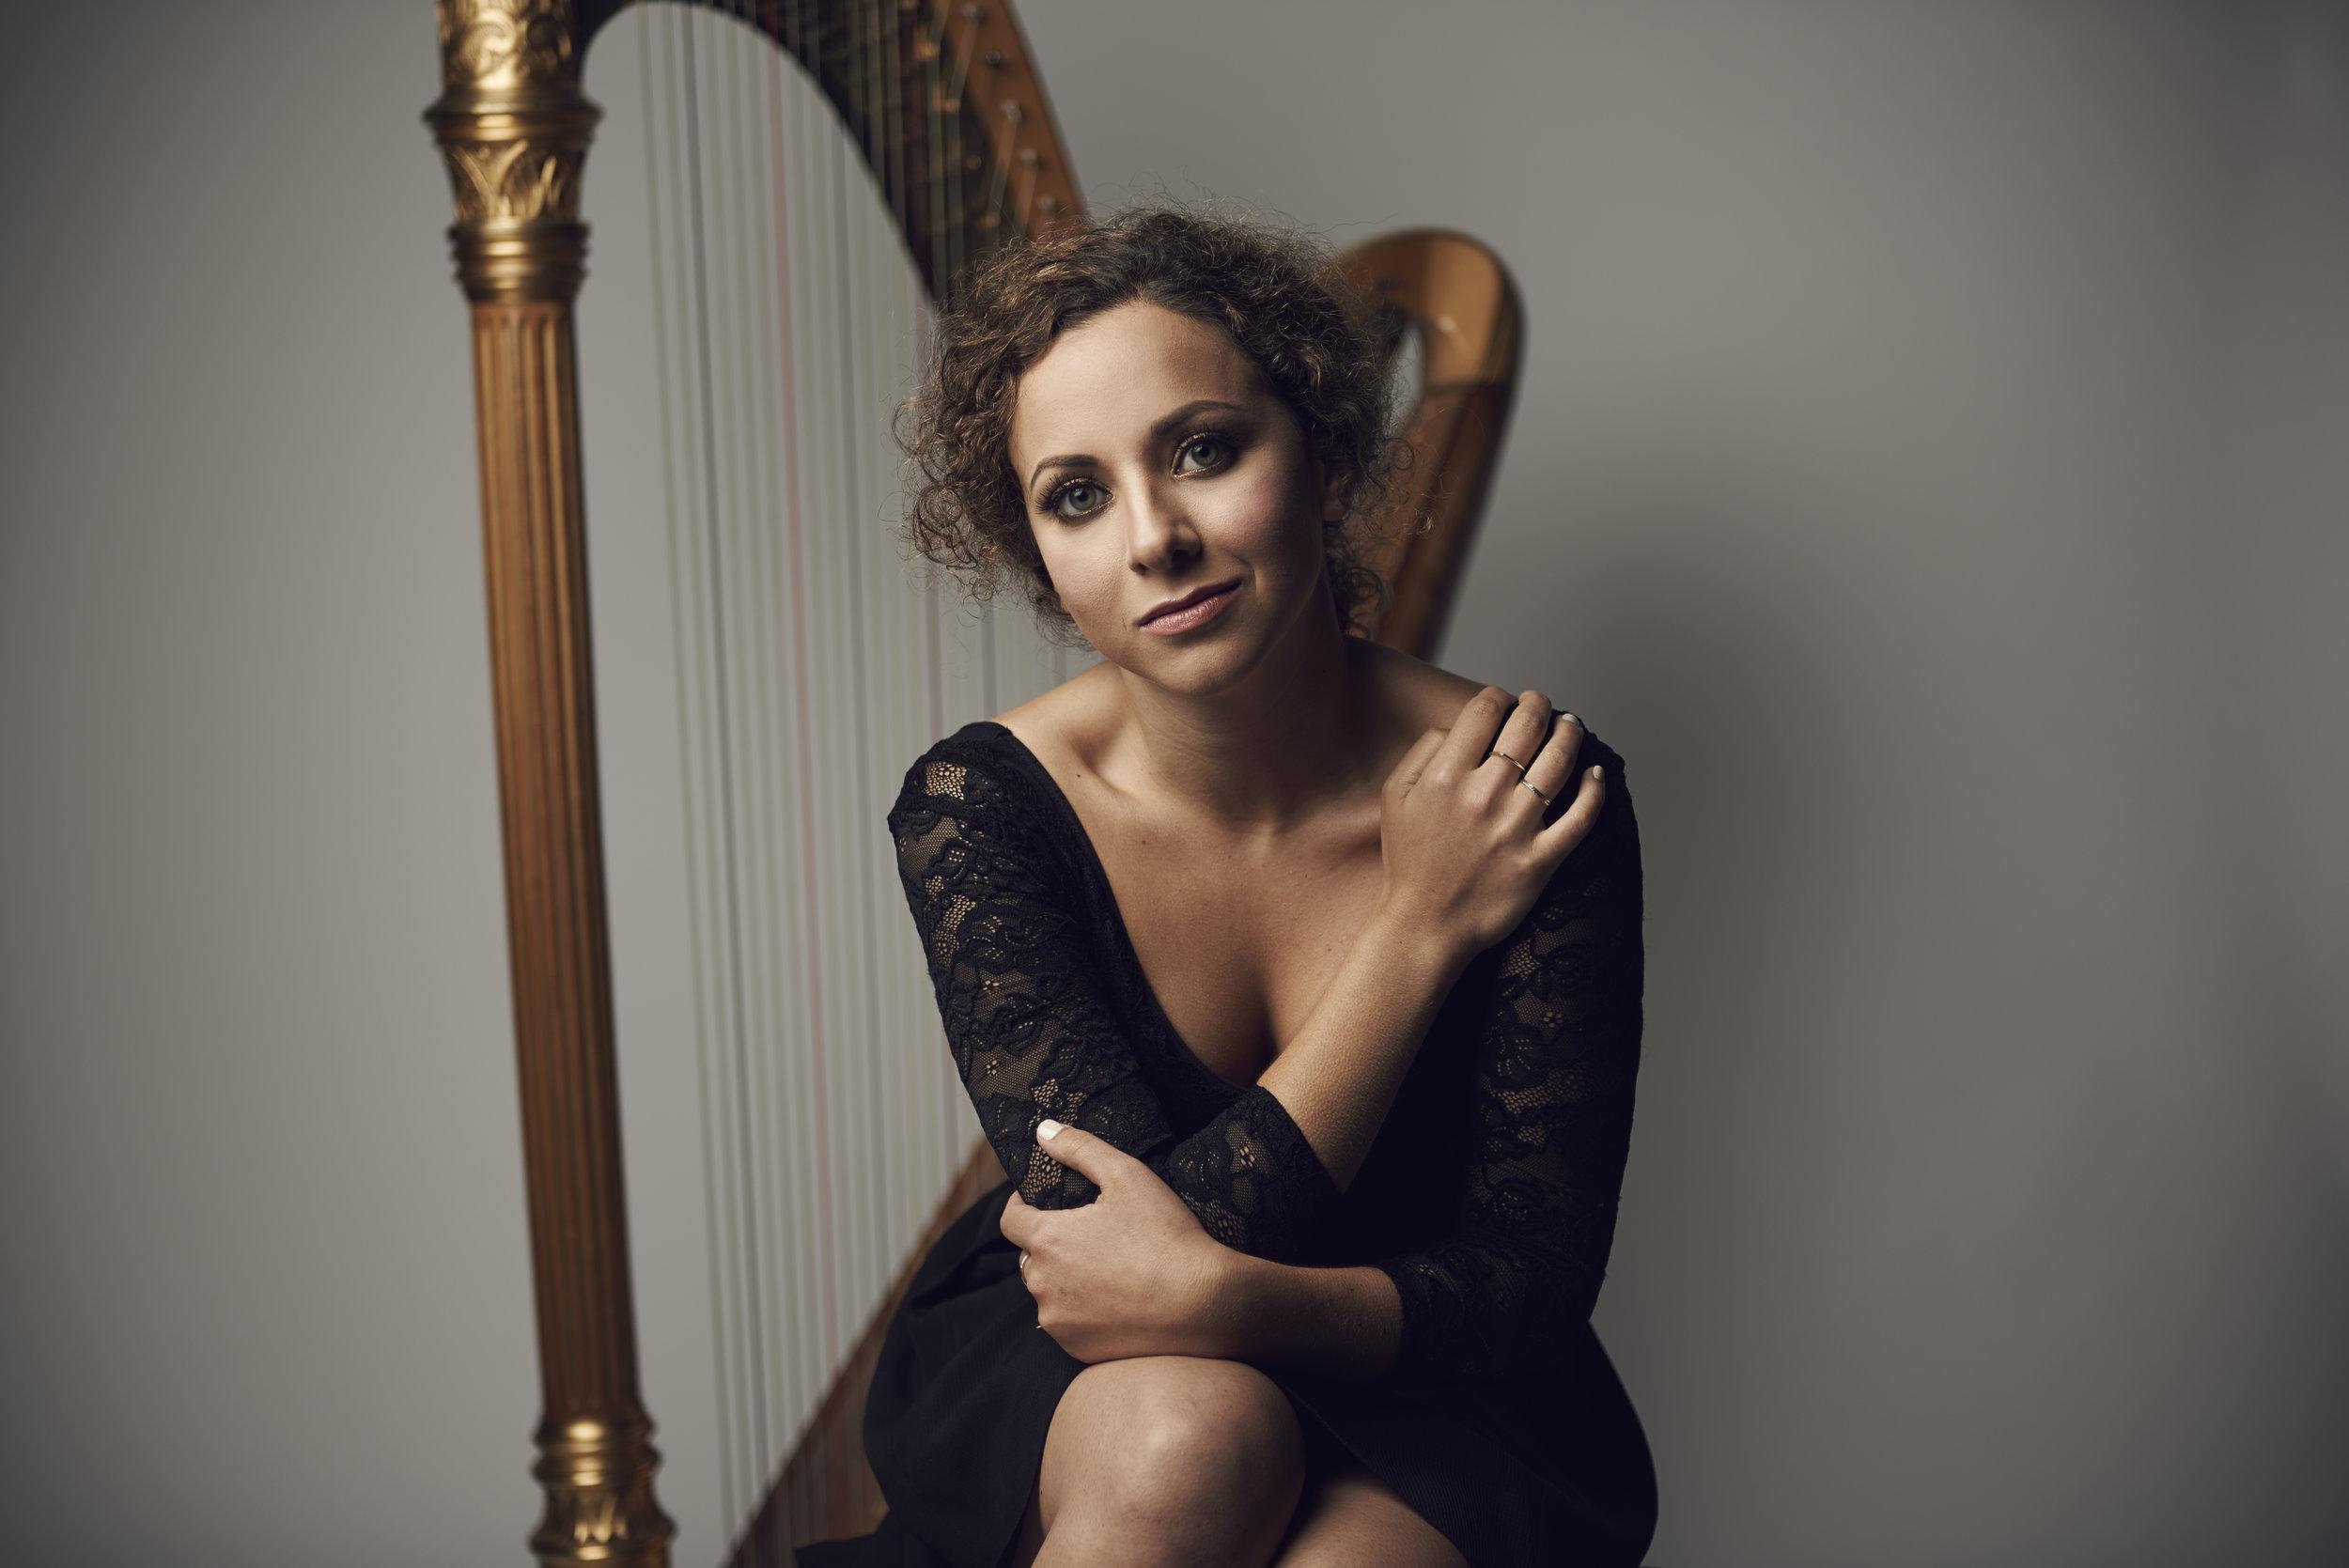 Natalie Lurie